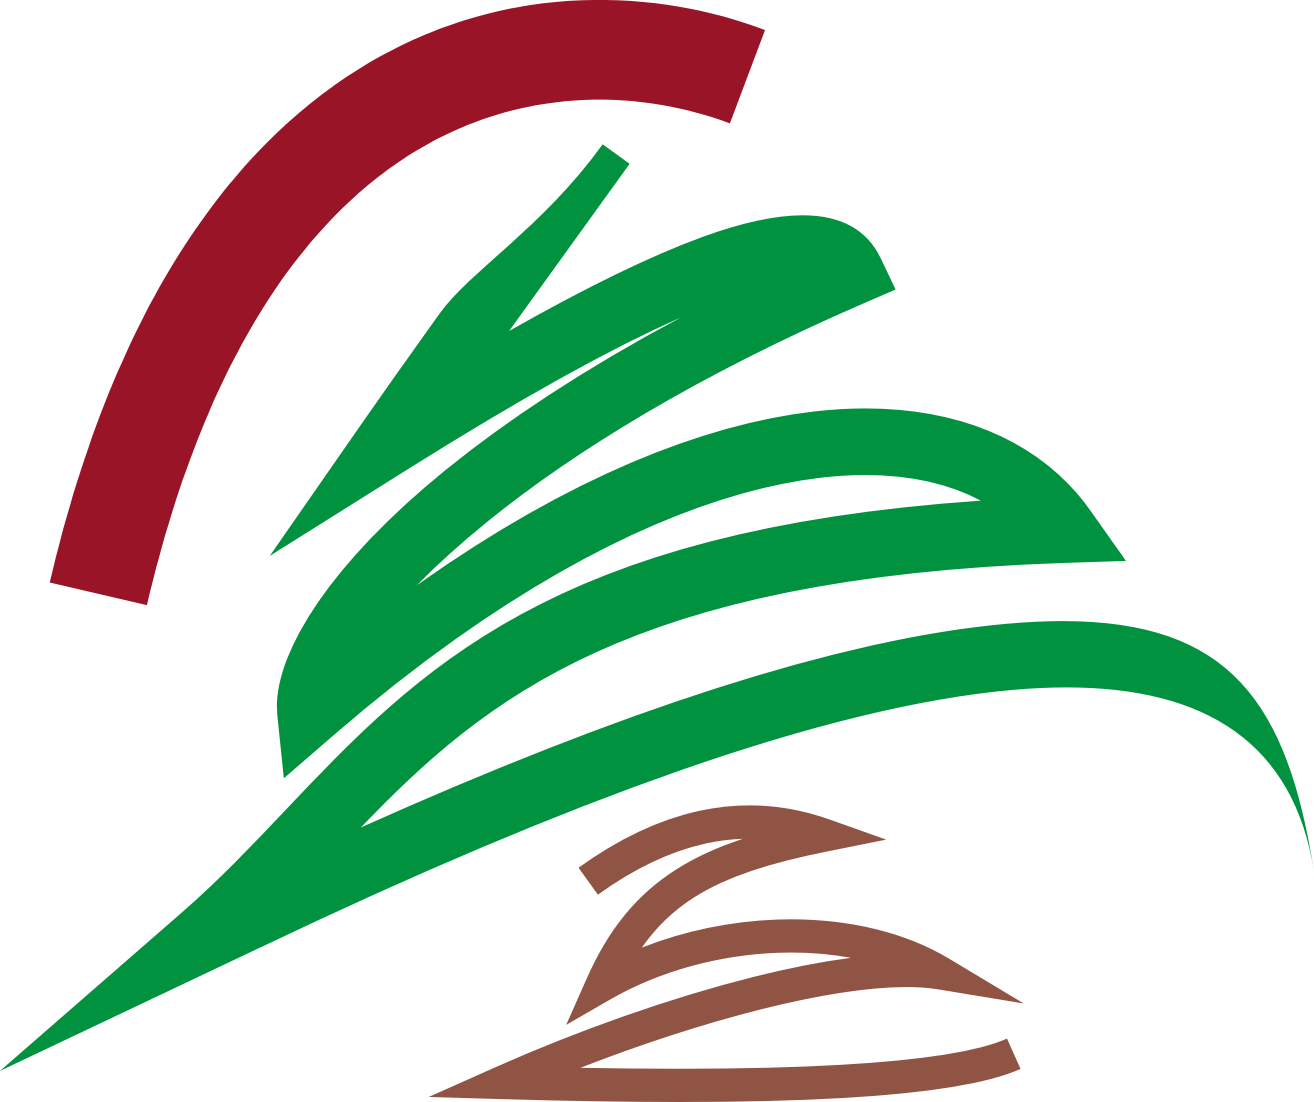 Tree File Cedaricon Png Wikimedia Commons